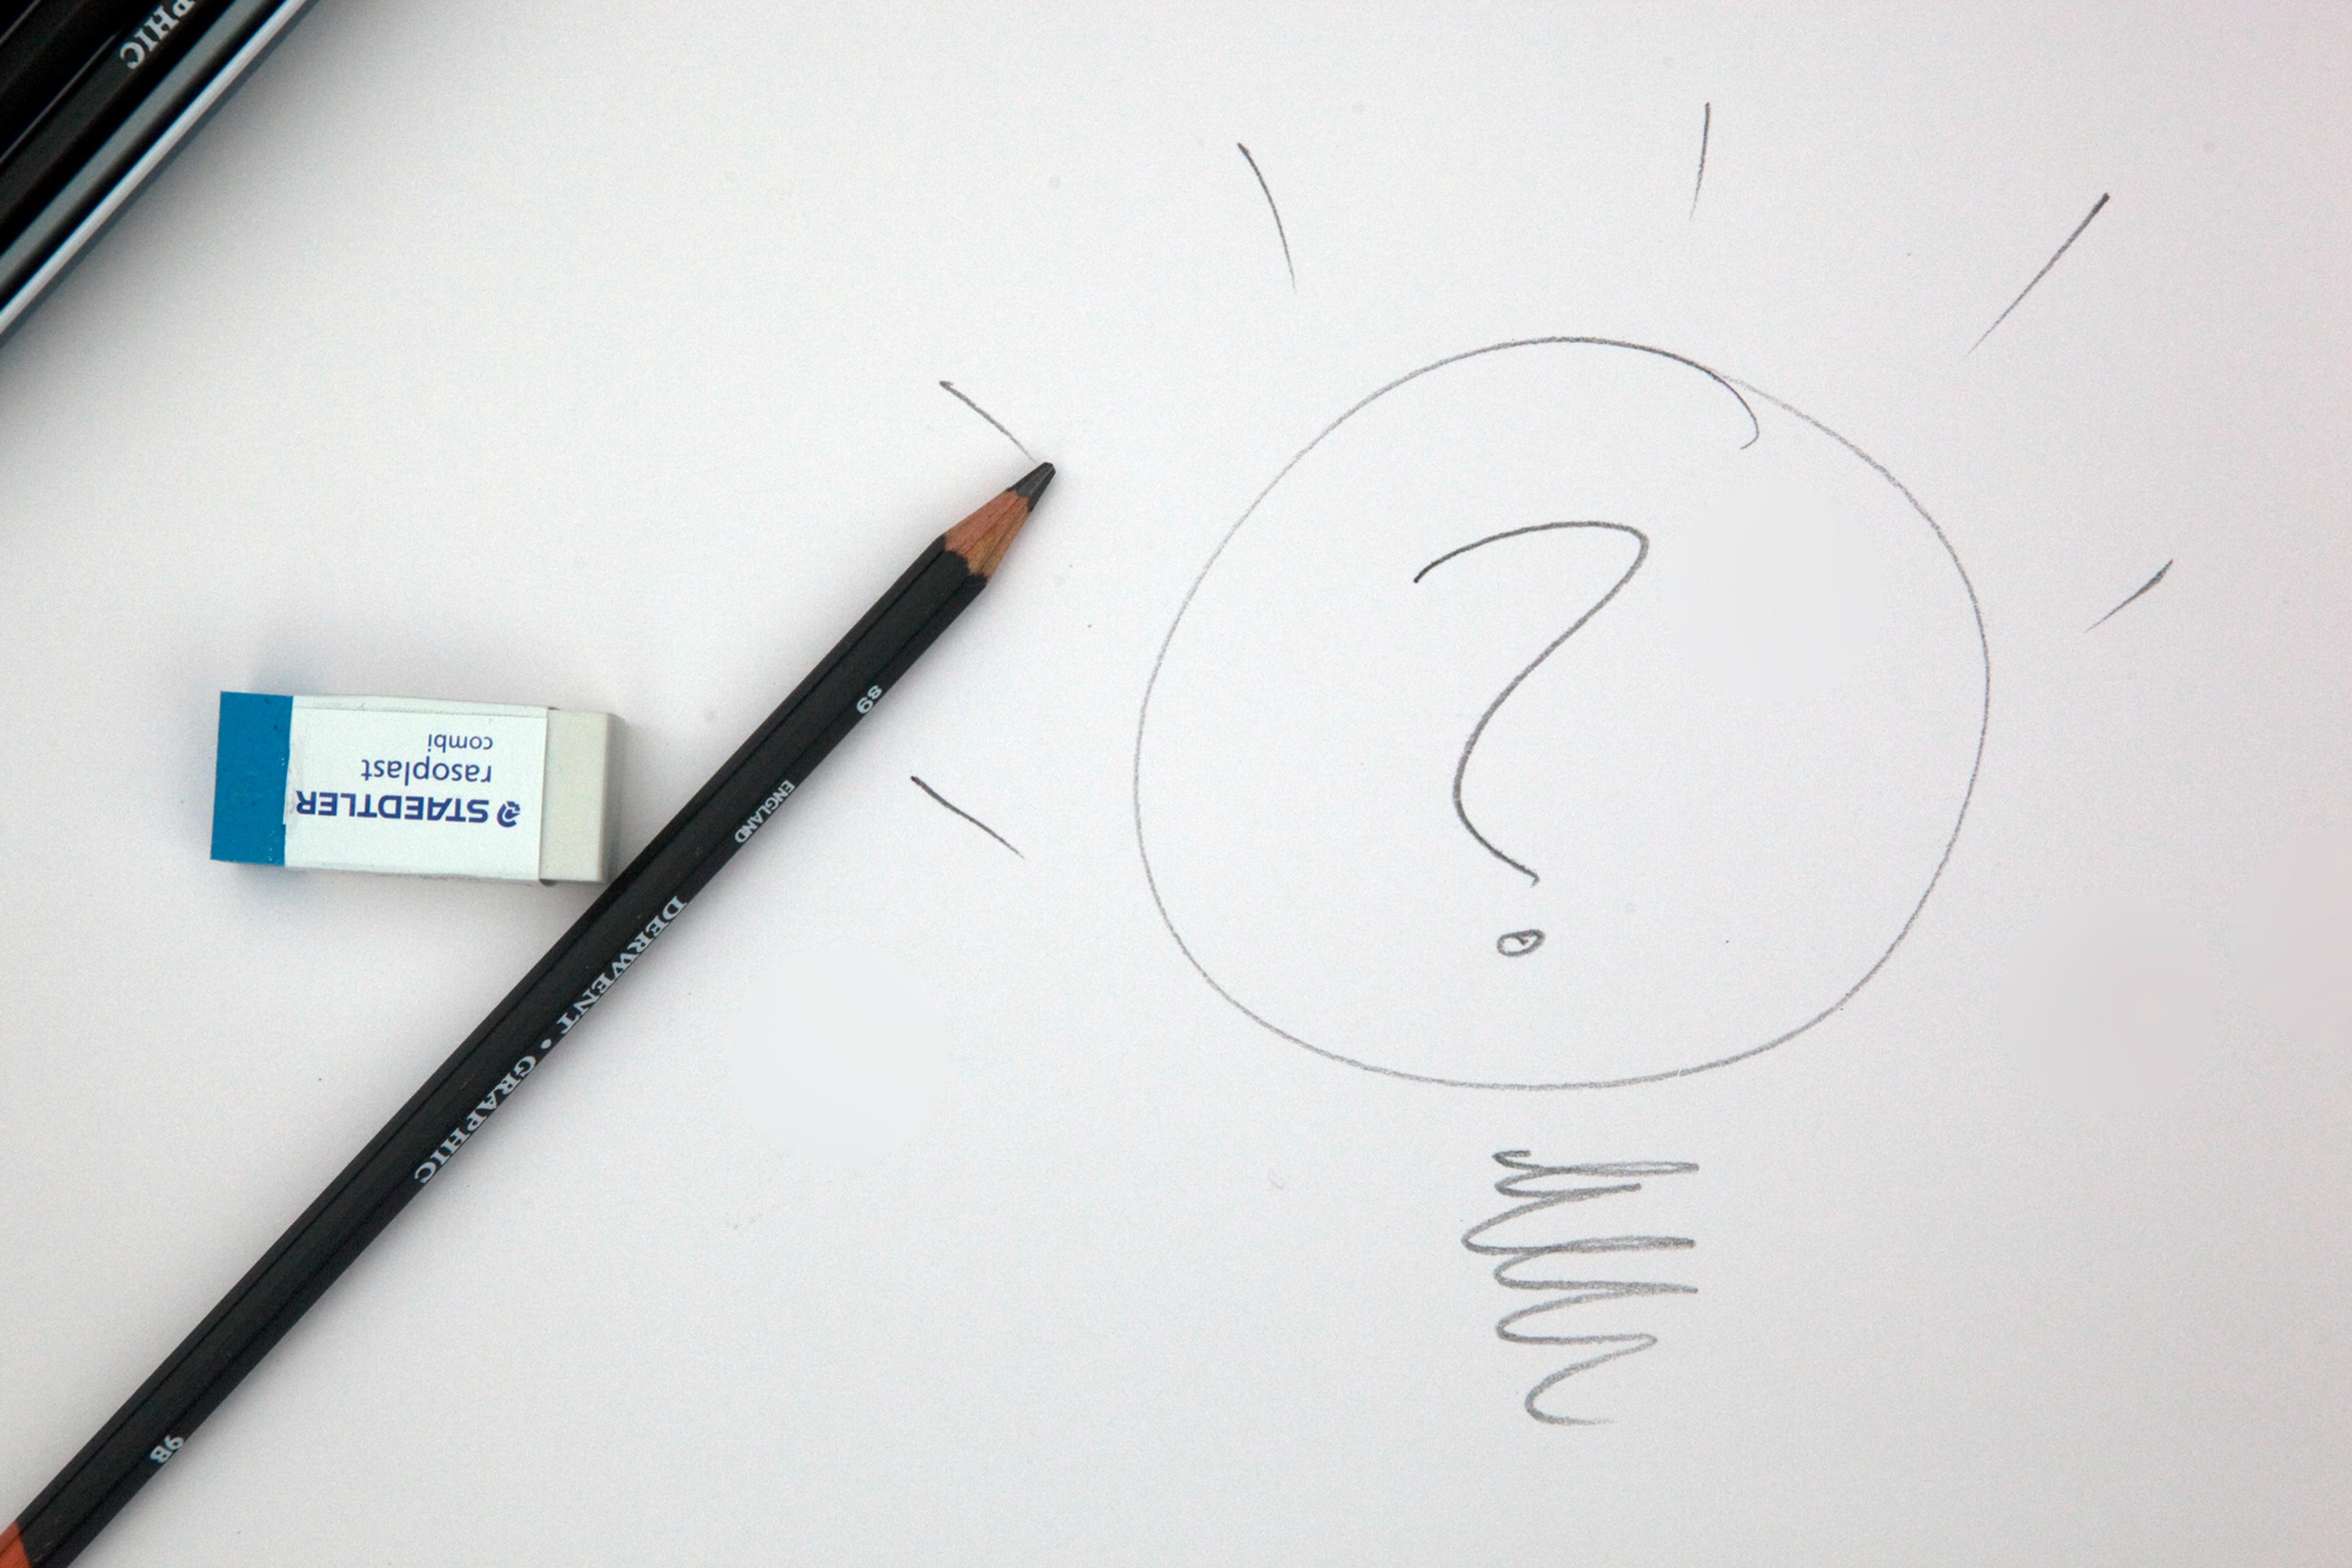 Values, Goals & Strategy Exploration